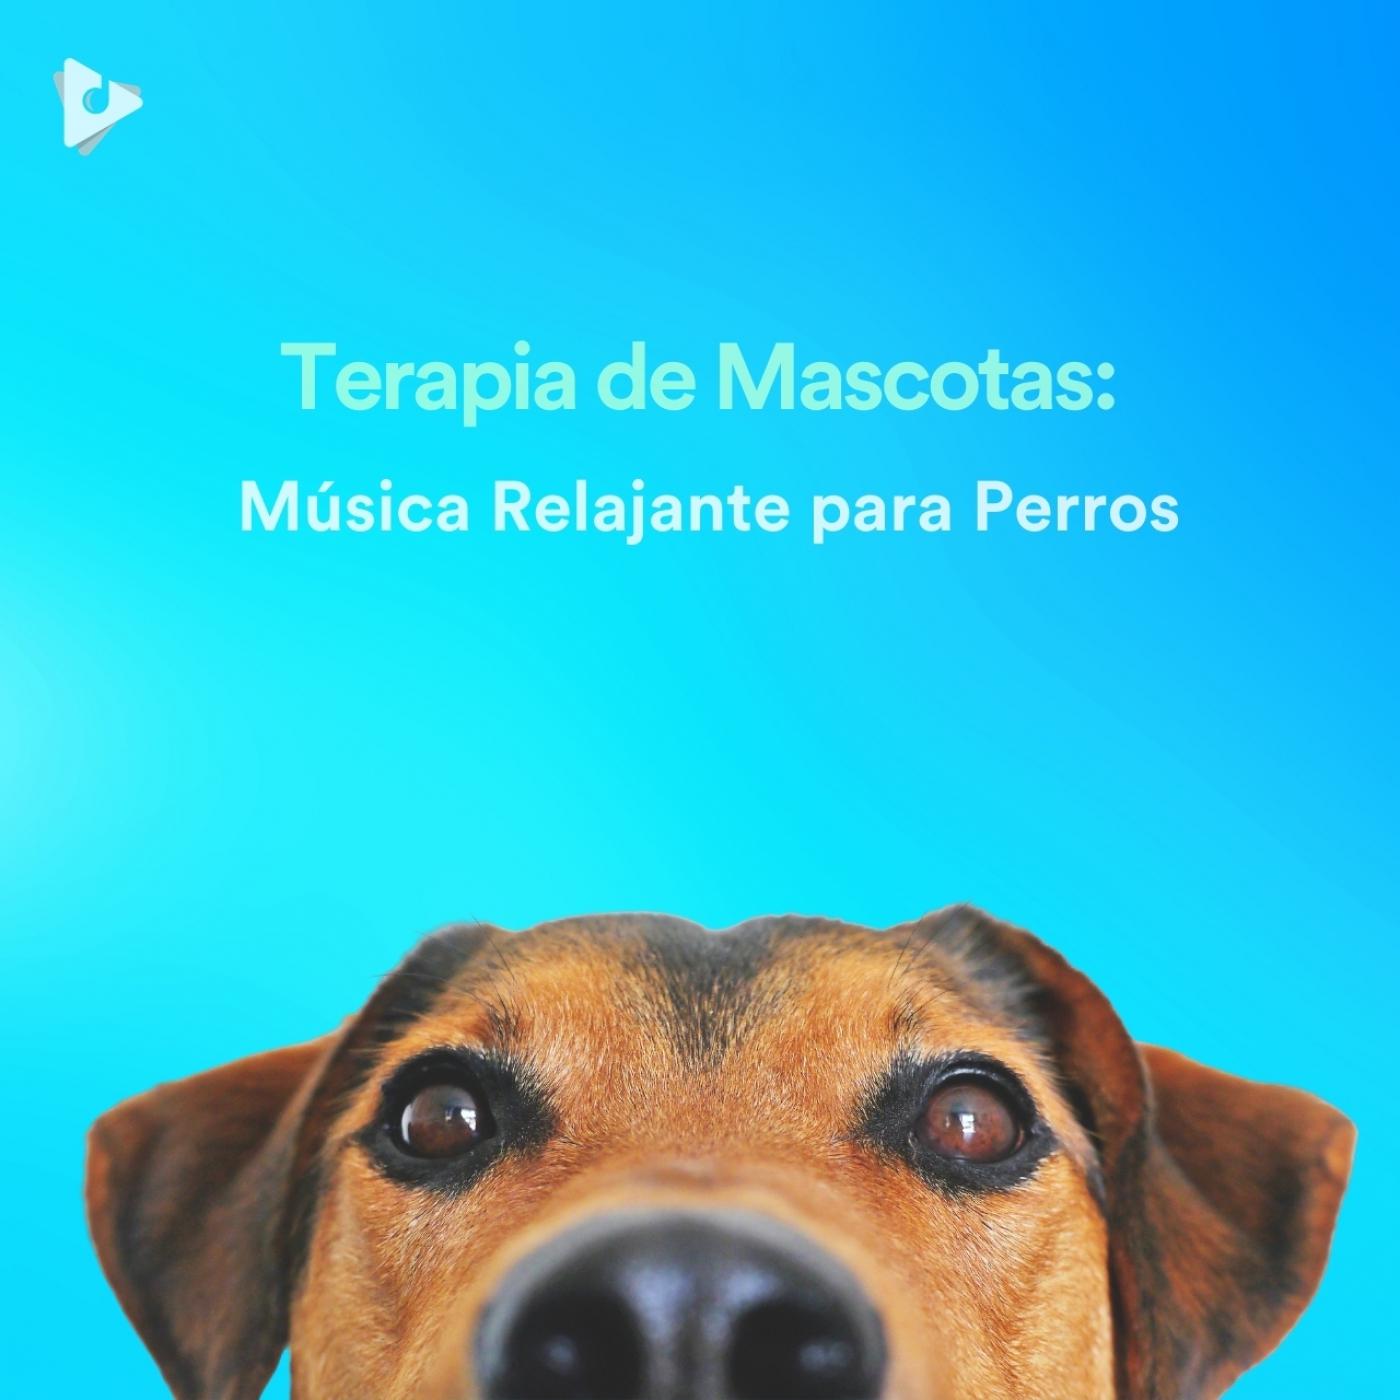 Terapia de Mascotas: Música Relajante para Perros